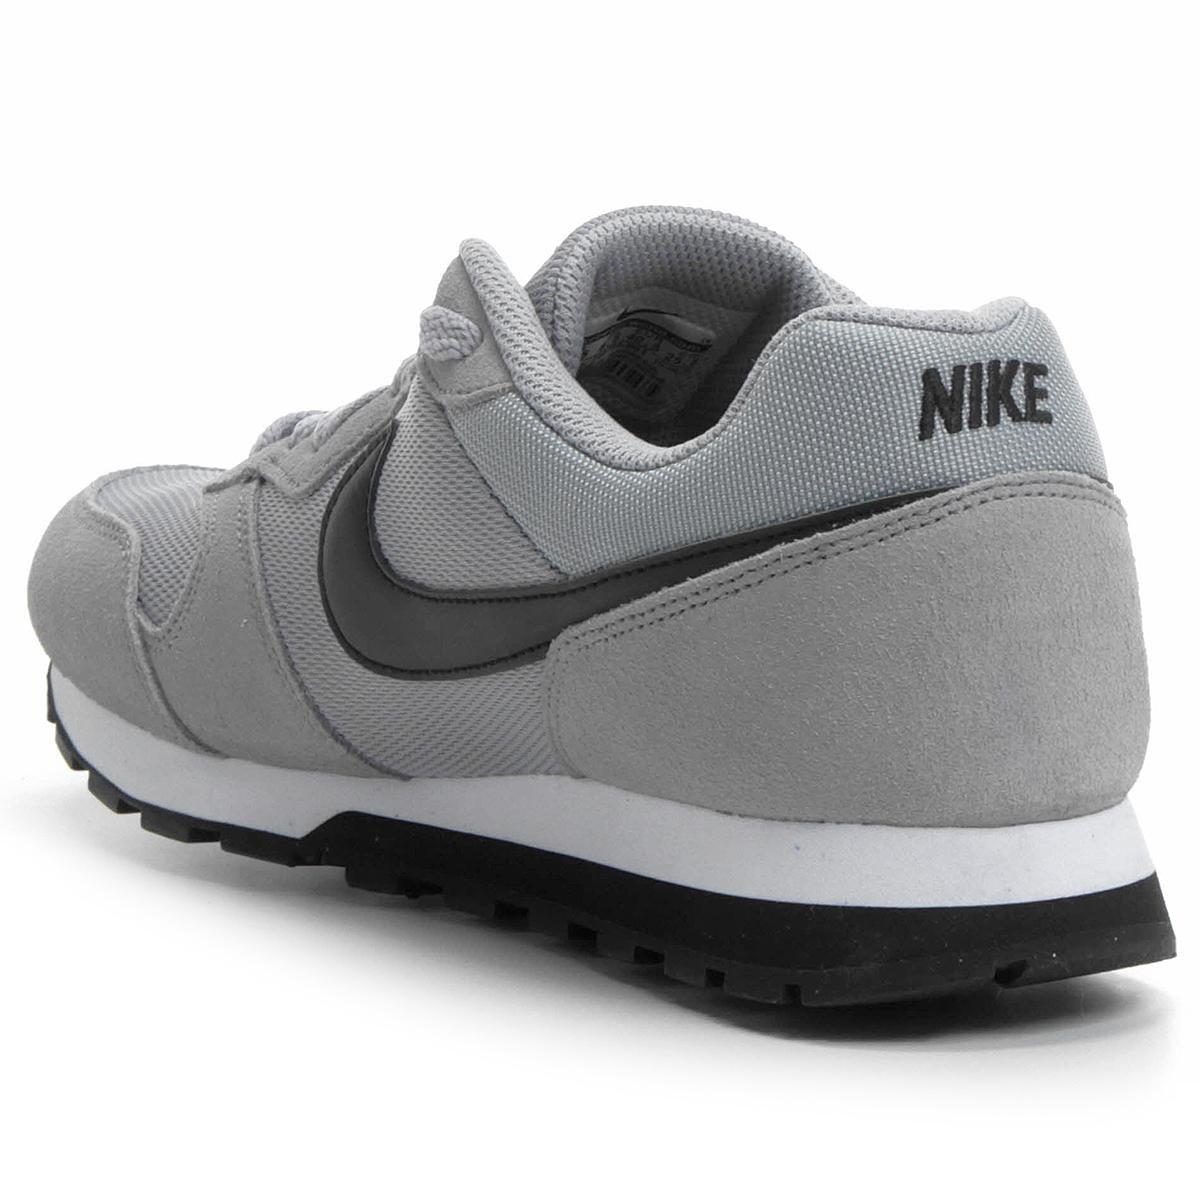 Tênis Nike Md Runner 2 Masculino - Tam: 44 - 2